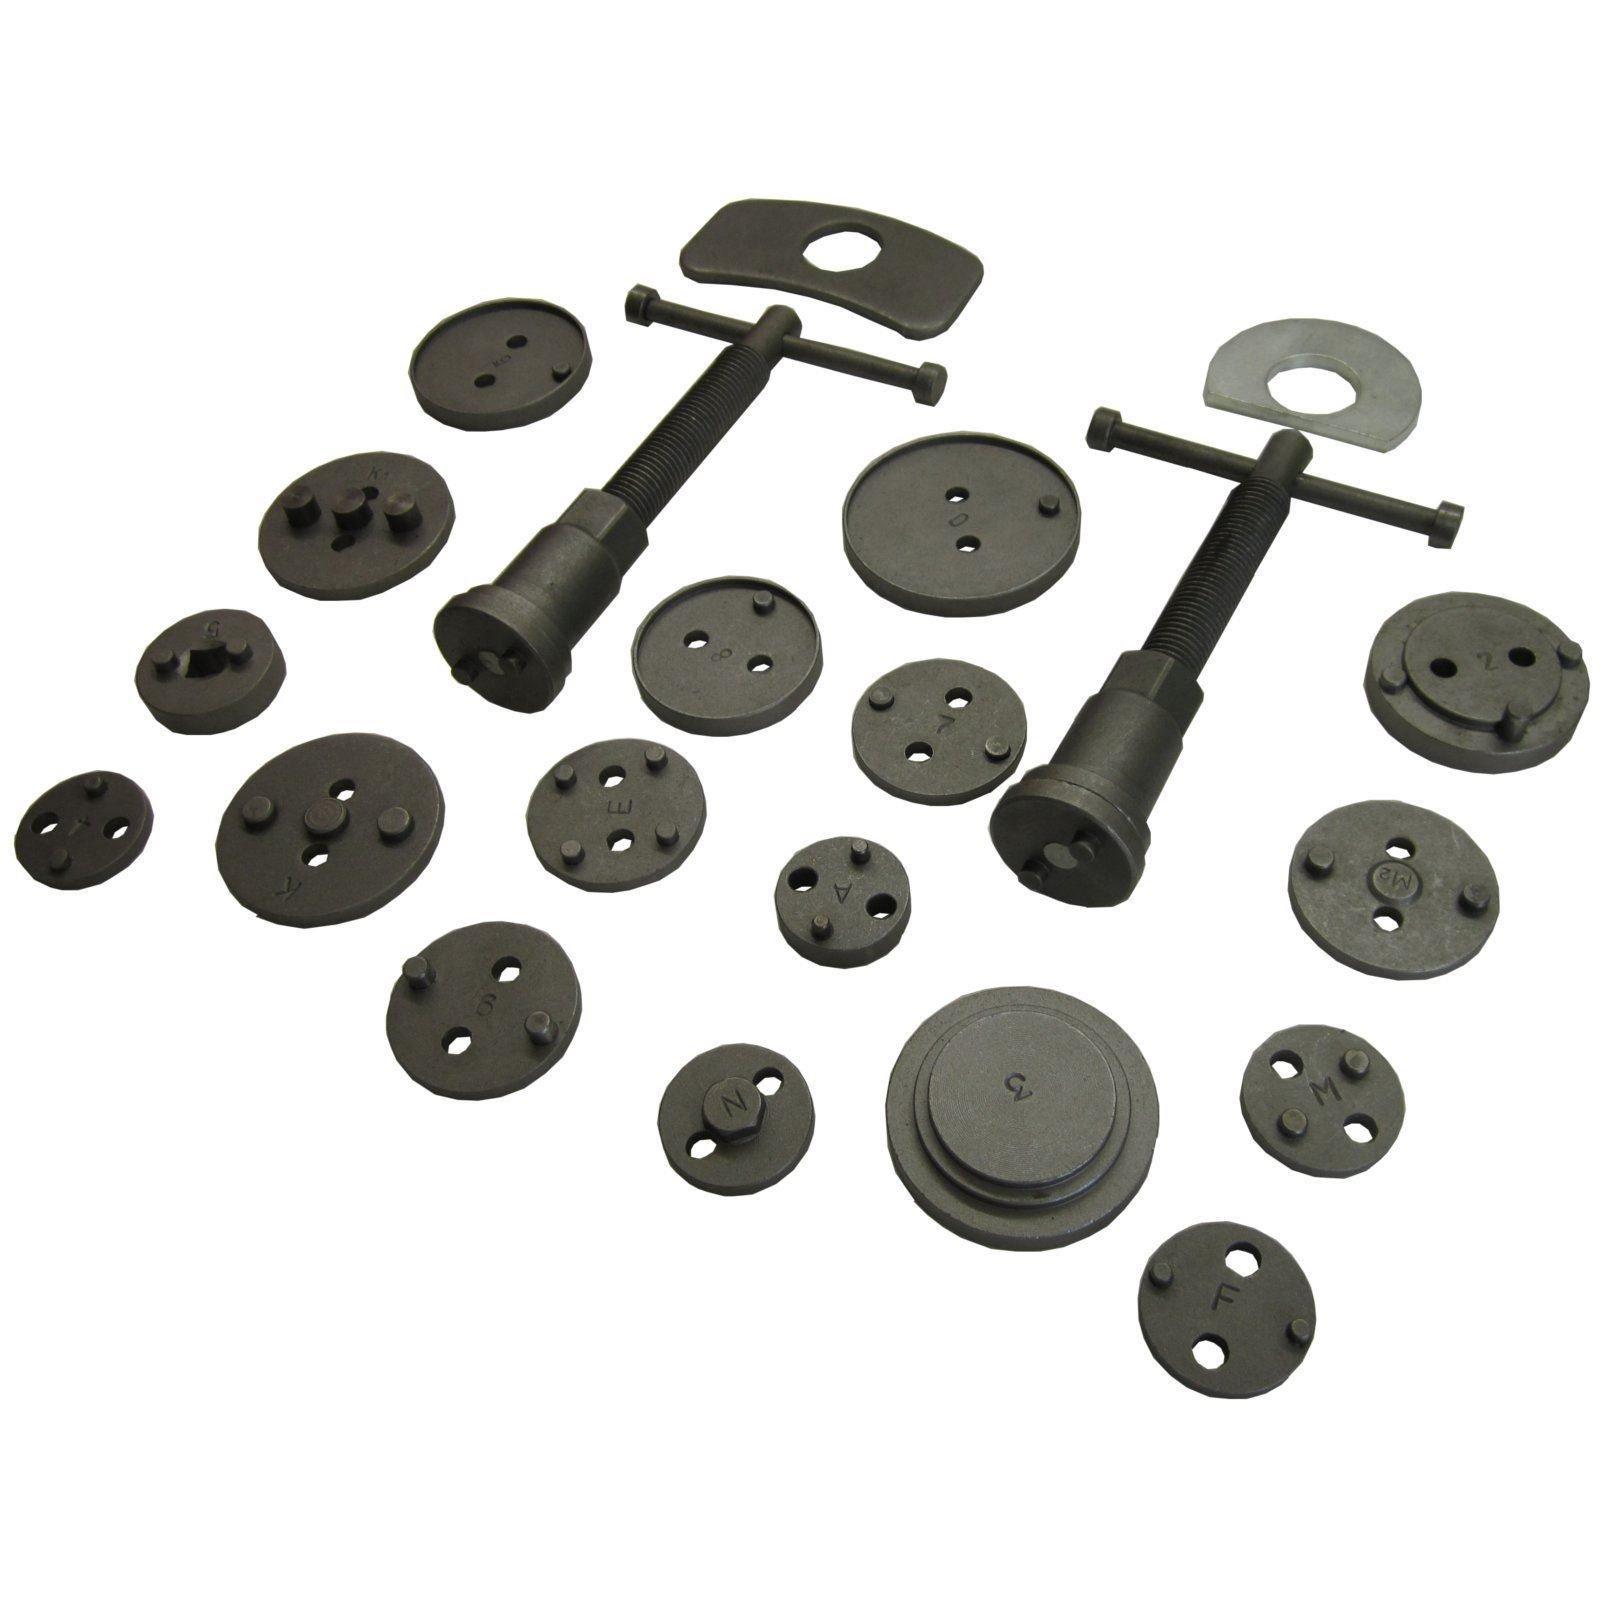 AB Tools-Toolzone 21pc Left and Right Hand Brake Calliper Piston Wind Back Tool Kit TE521